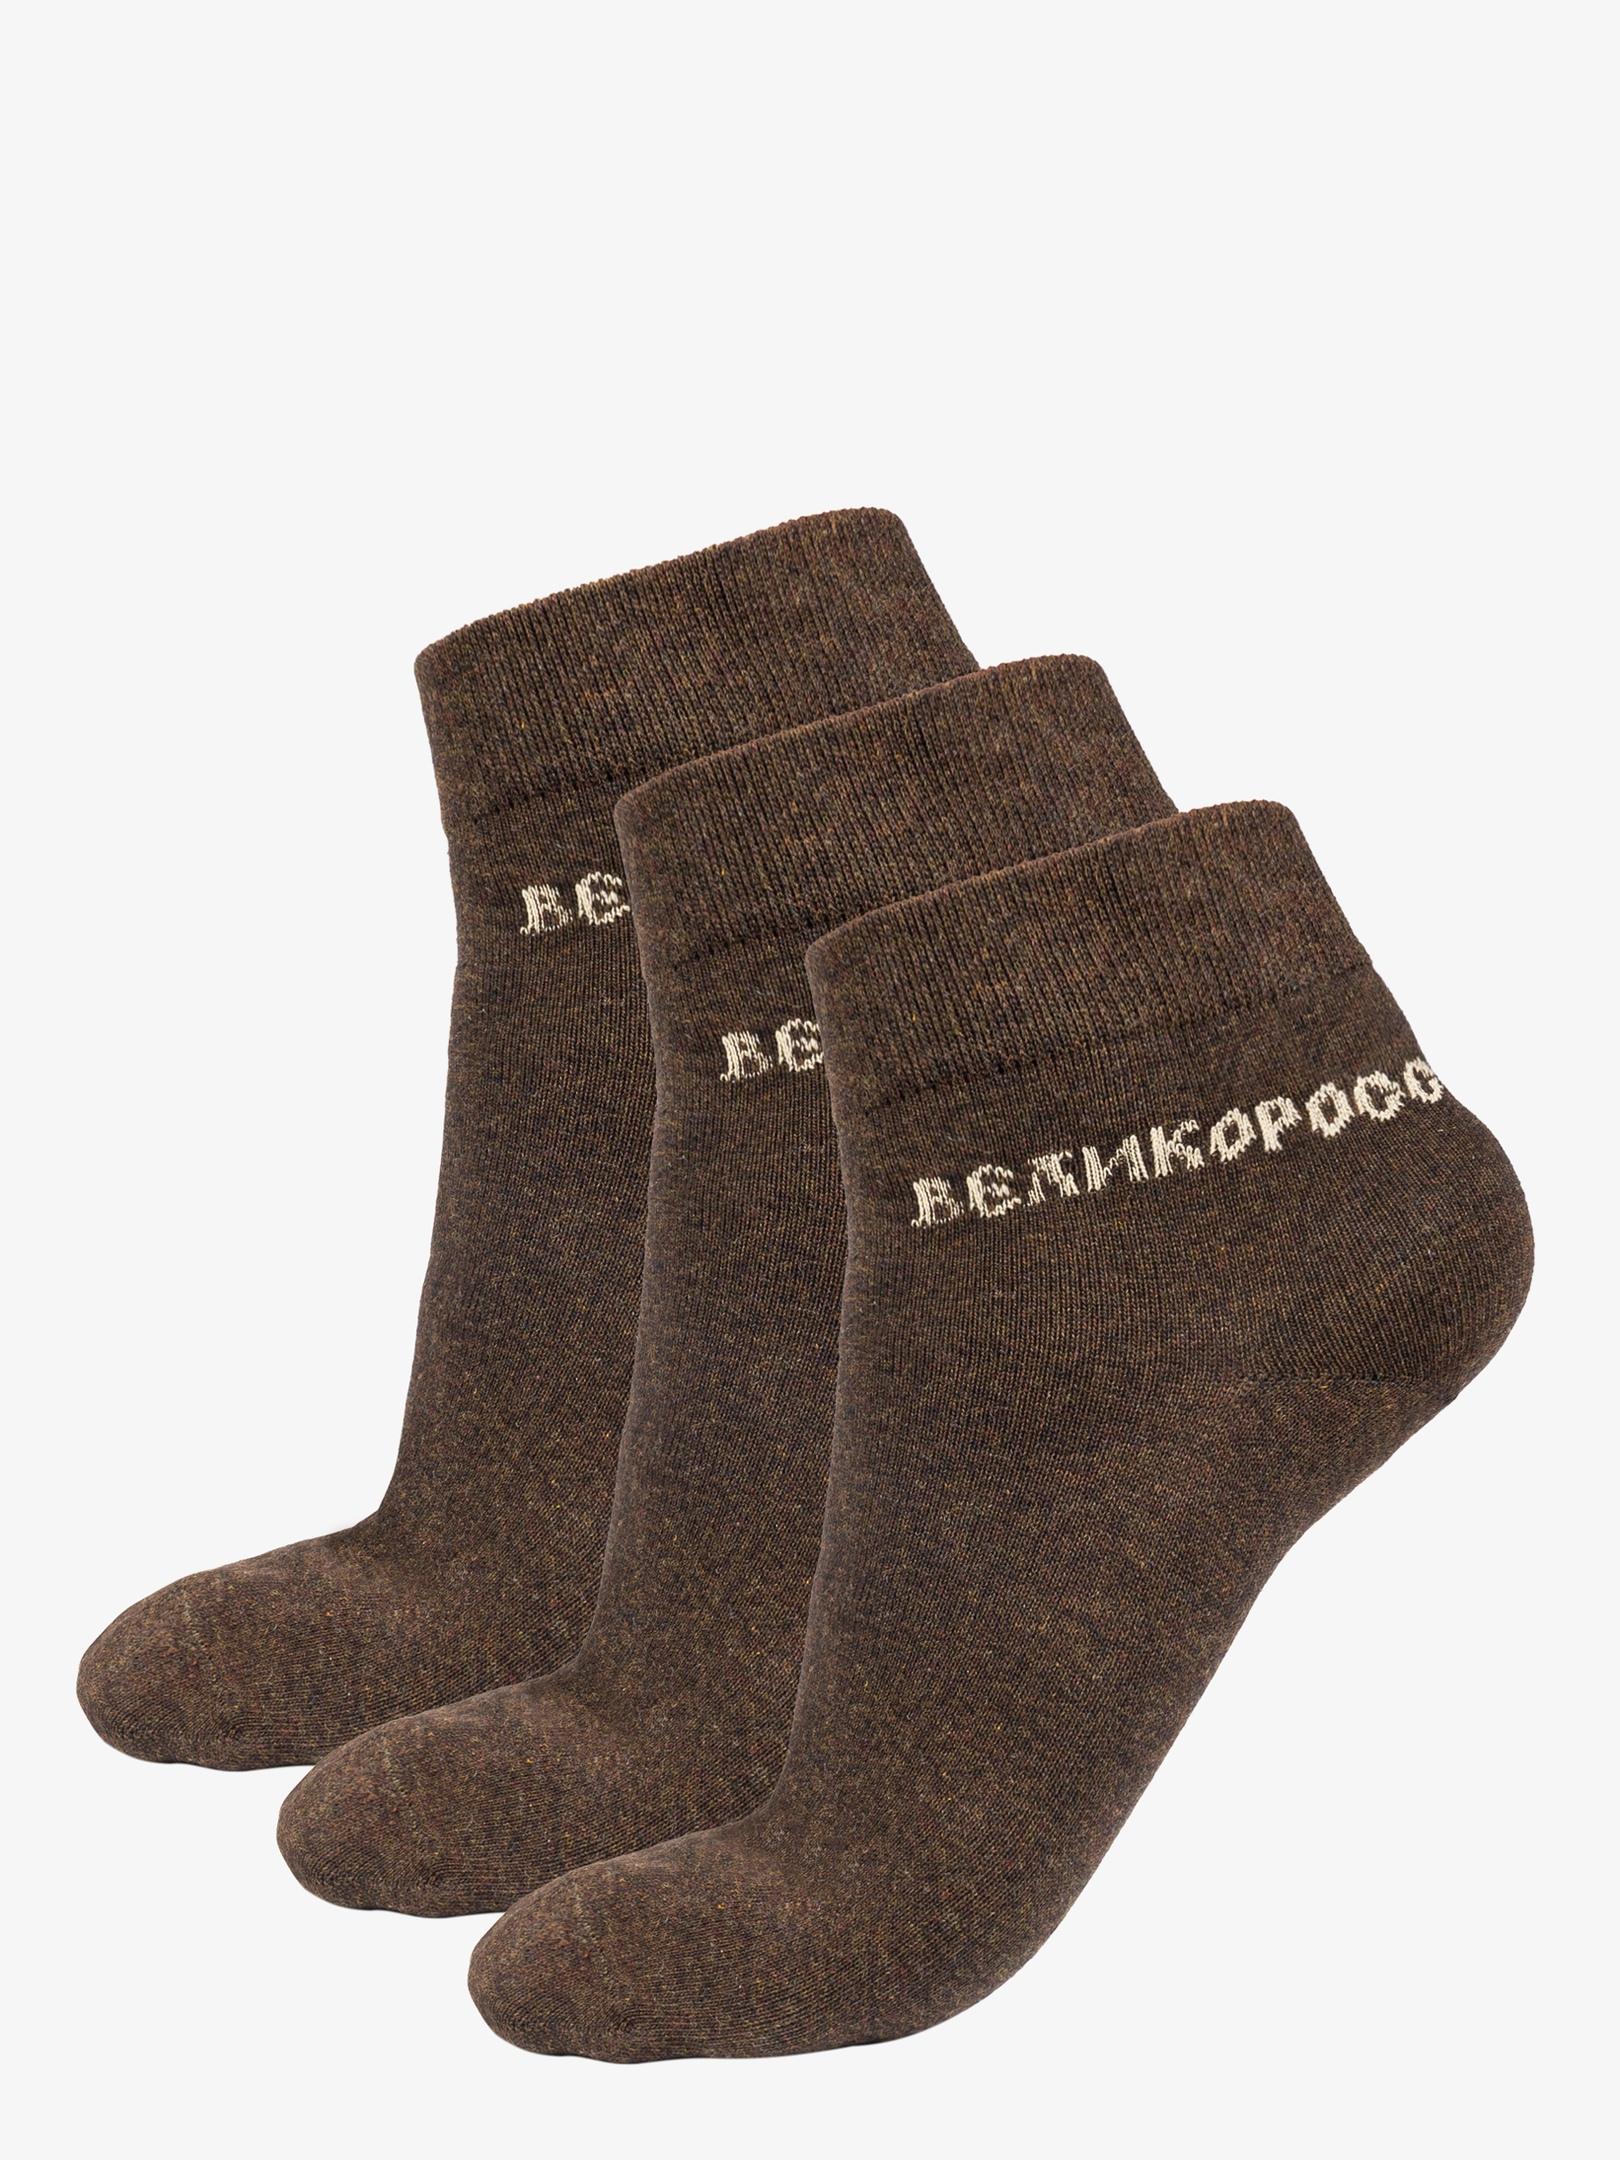 Носки унисекс Великоросс NN35511 коричневый 23